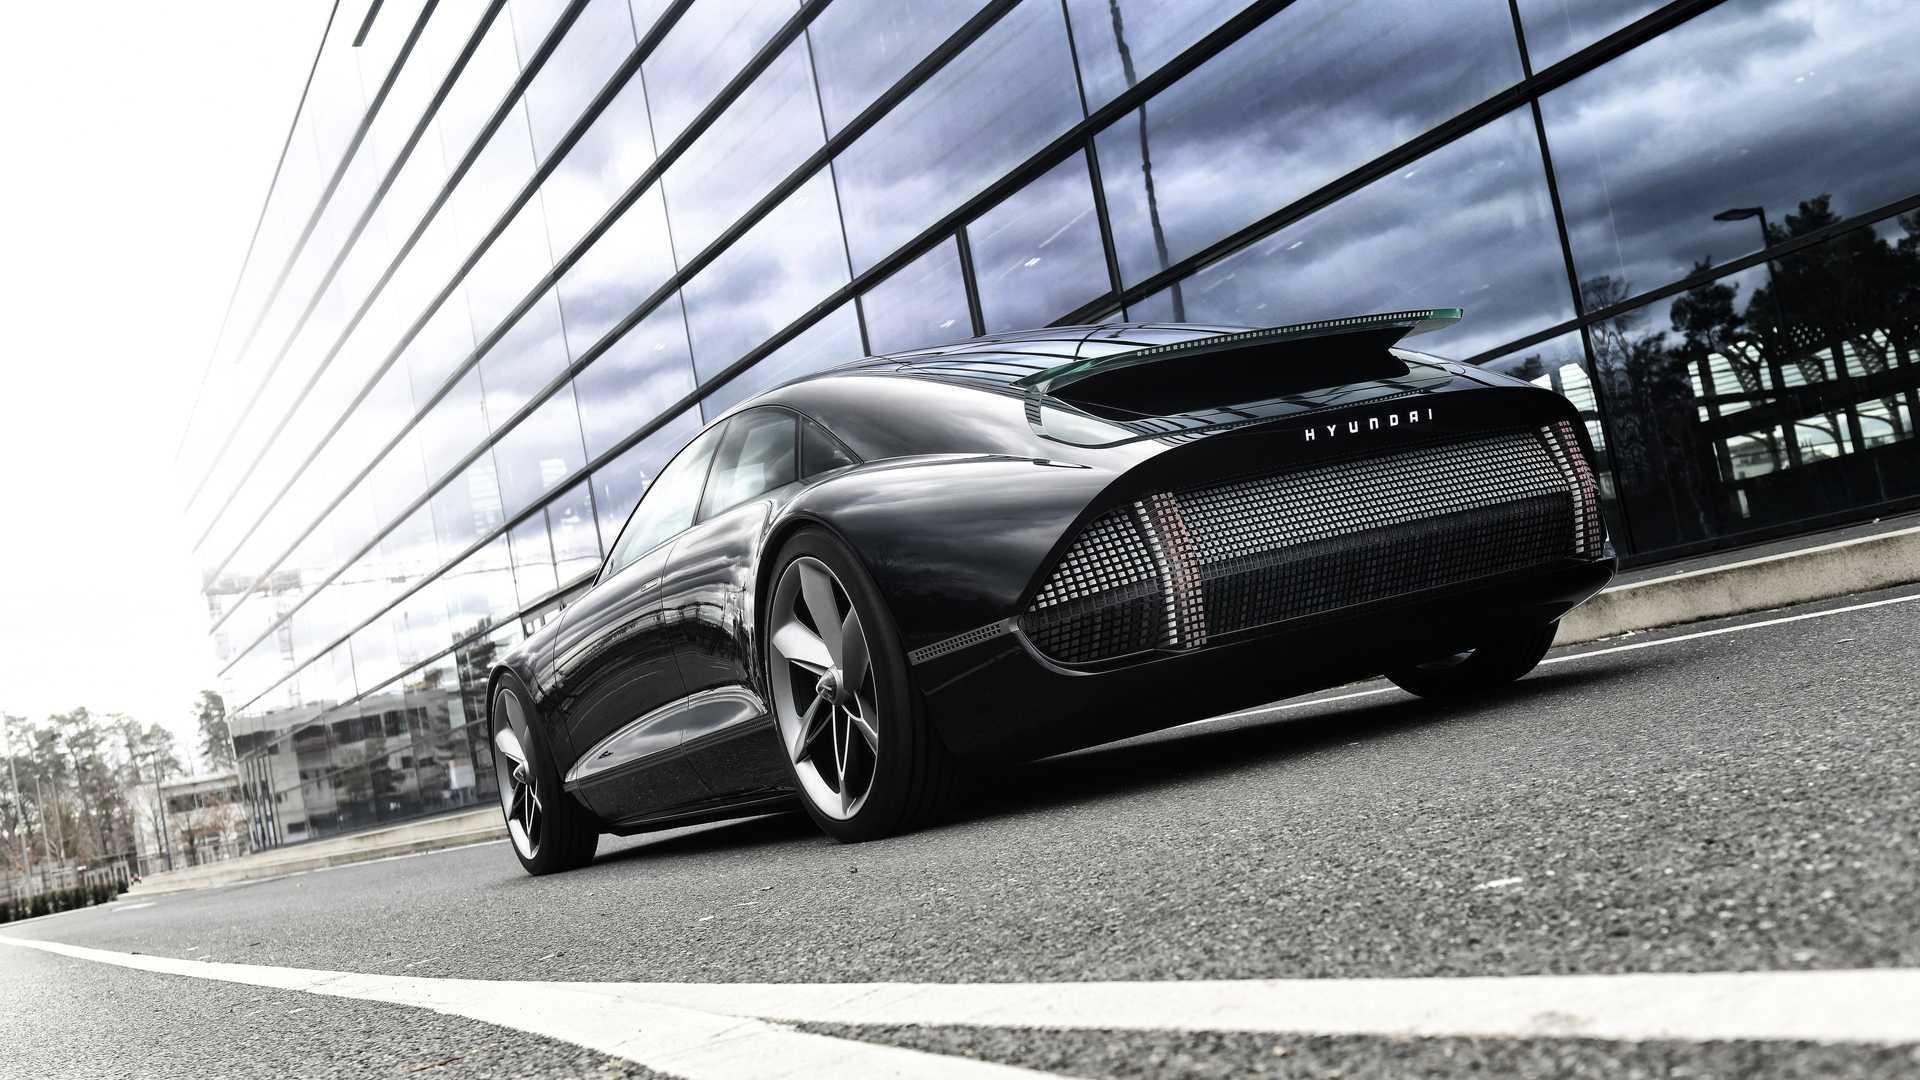 Speculating About The Hyundai Ioniq 6